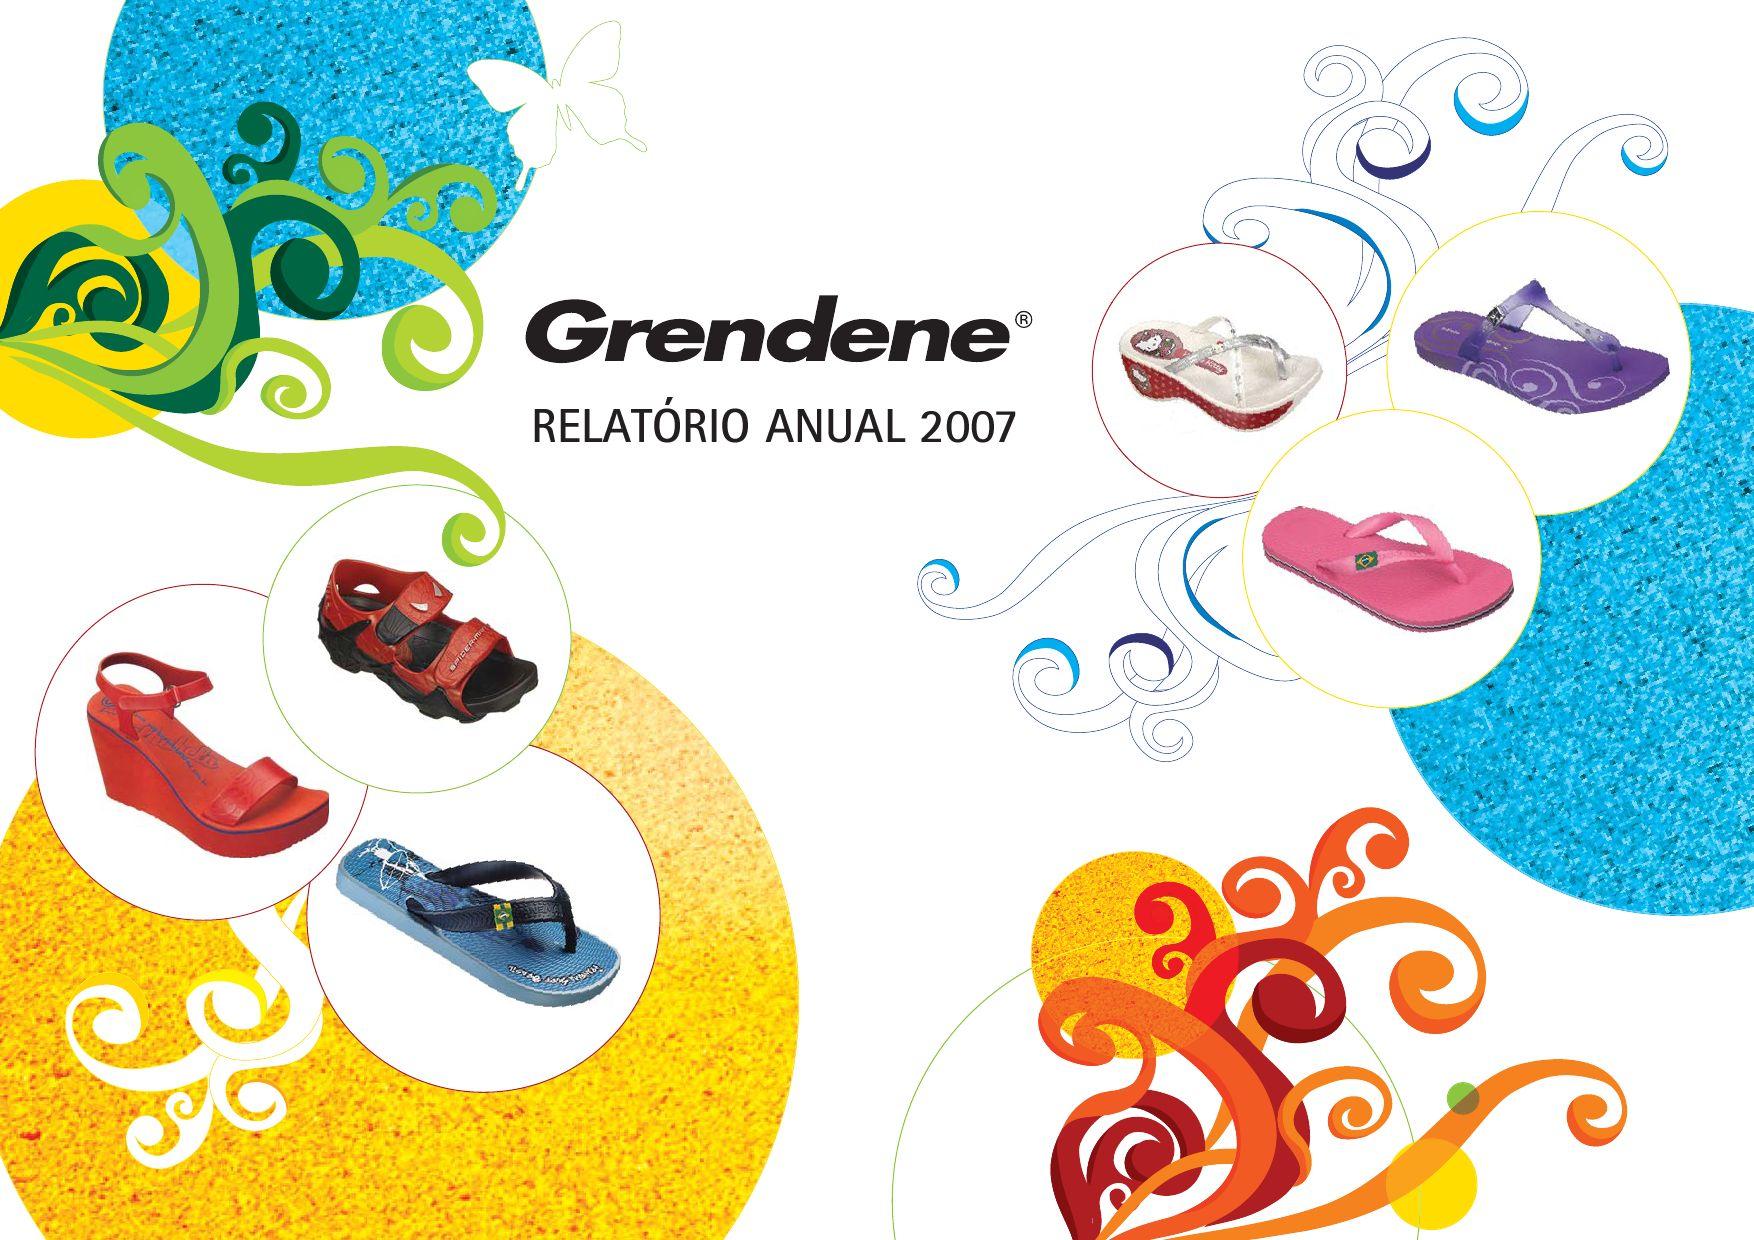 23034a4a1a651 Grendene - Relatório Anual 2007 by Grendene RI - issuu